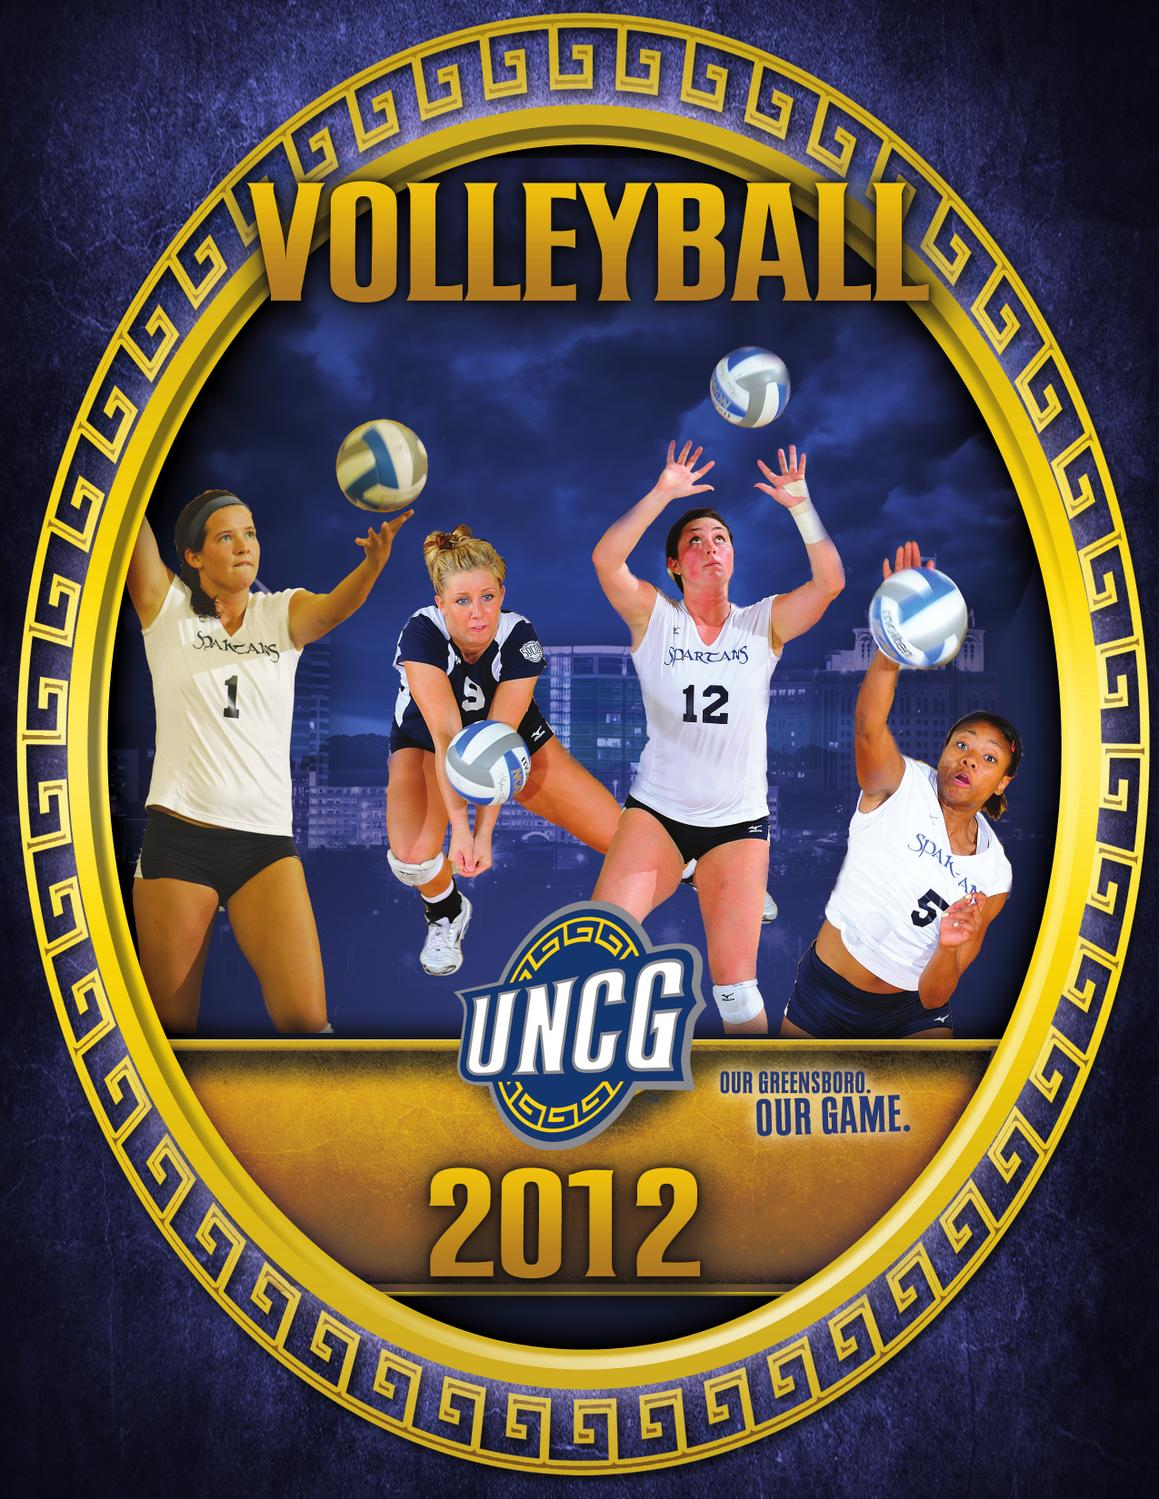 2012 UNCG Volleyball Digital Guide by UNCG Athletics - issuu